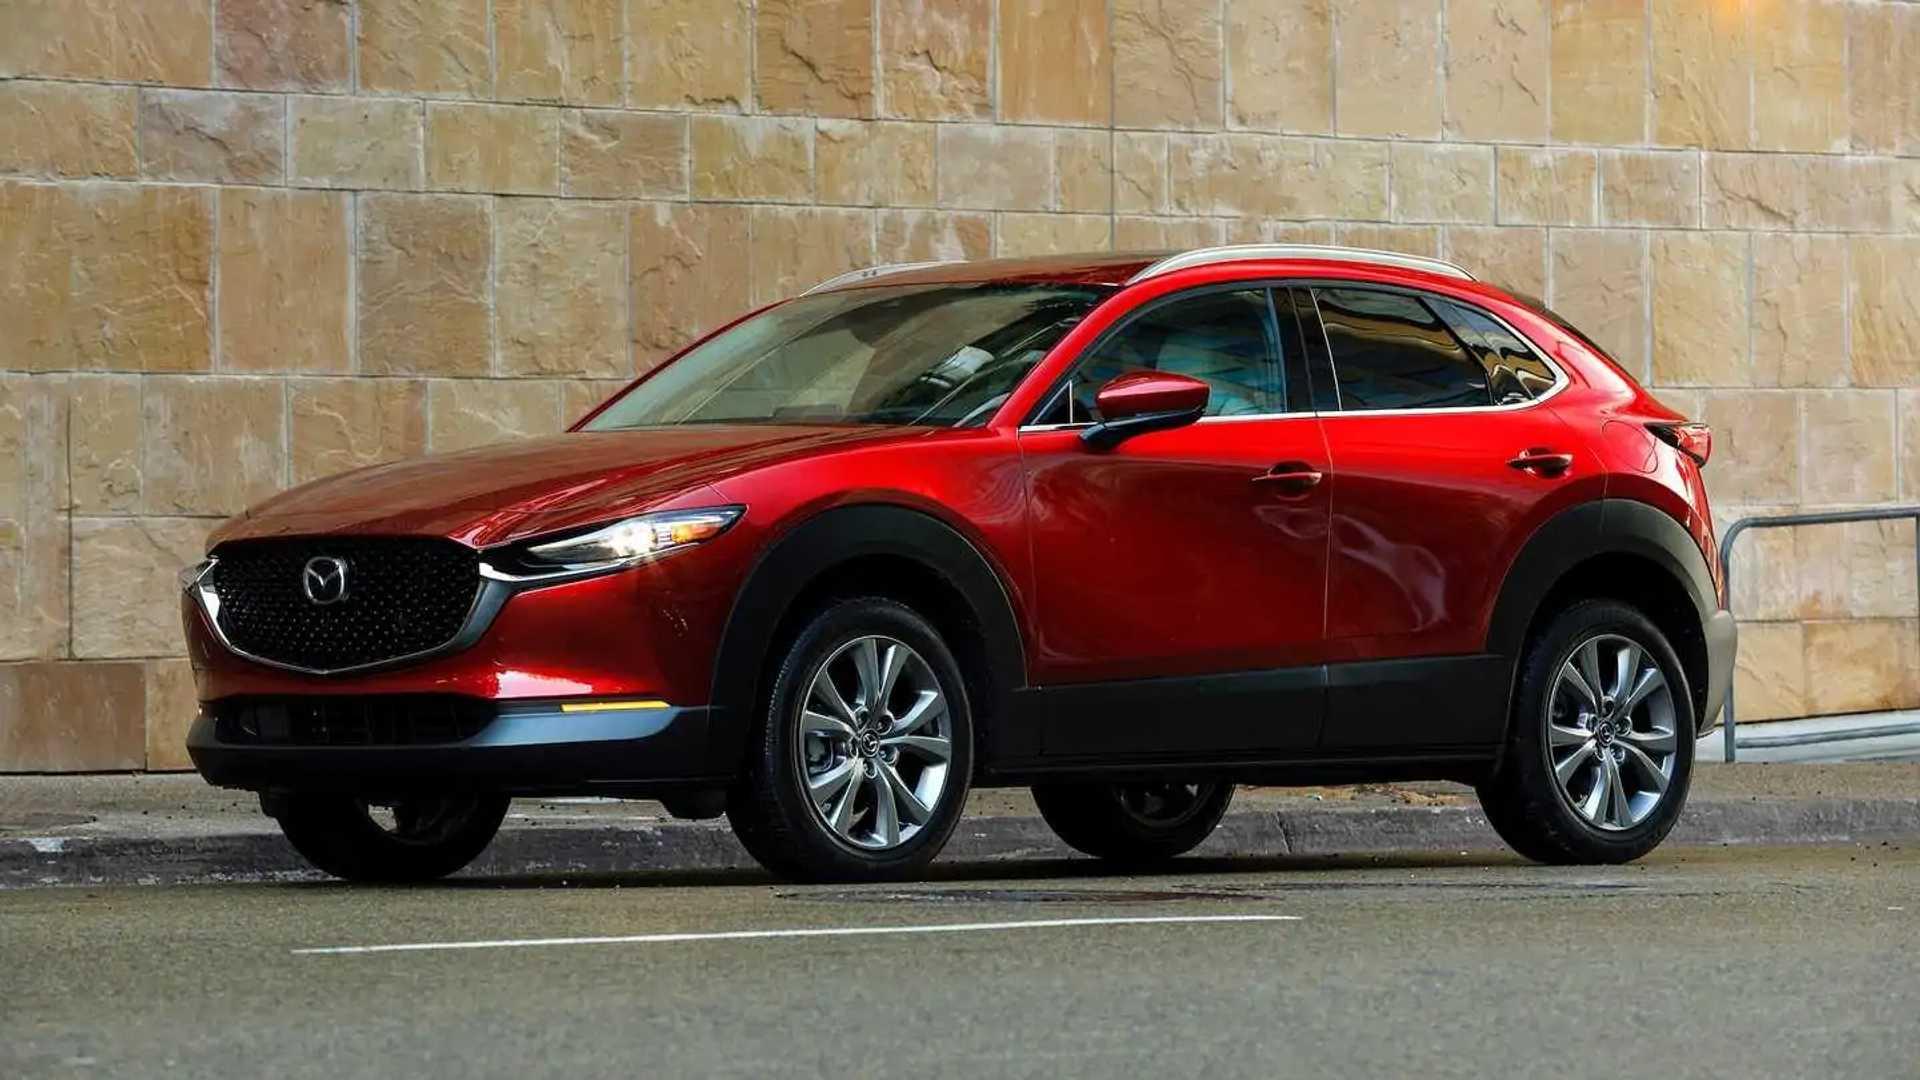 2020 Mazda CX-30 First Drive Review: Subcompact No Longer Means Subpar